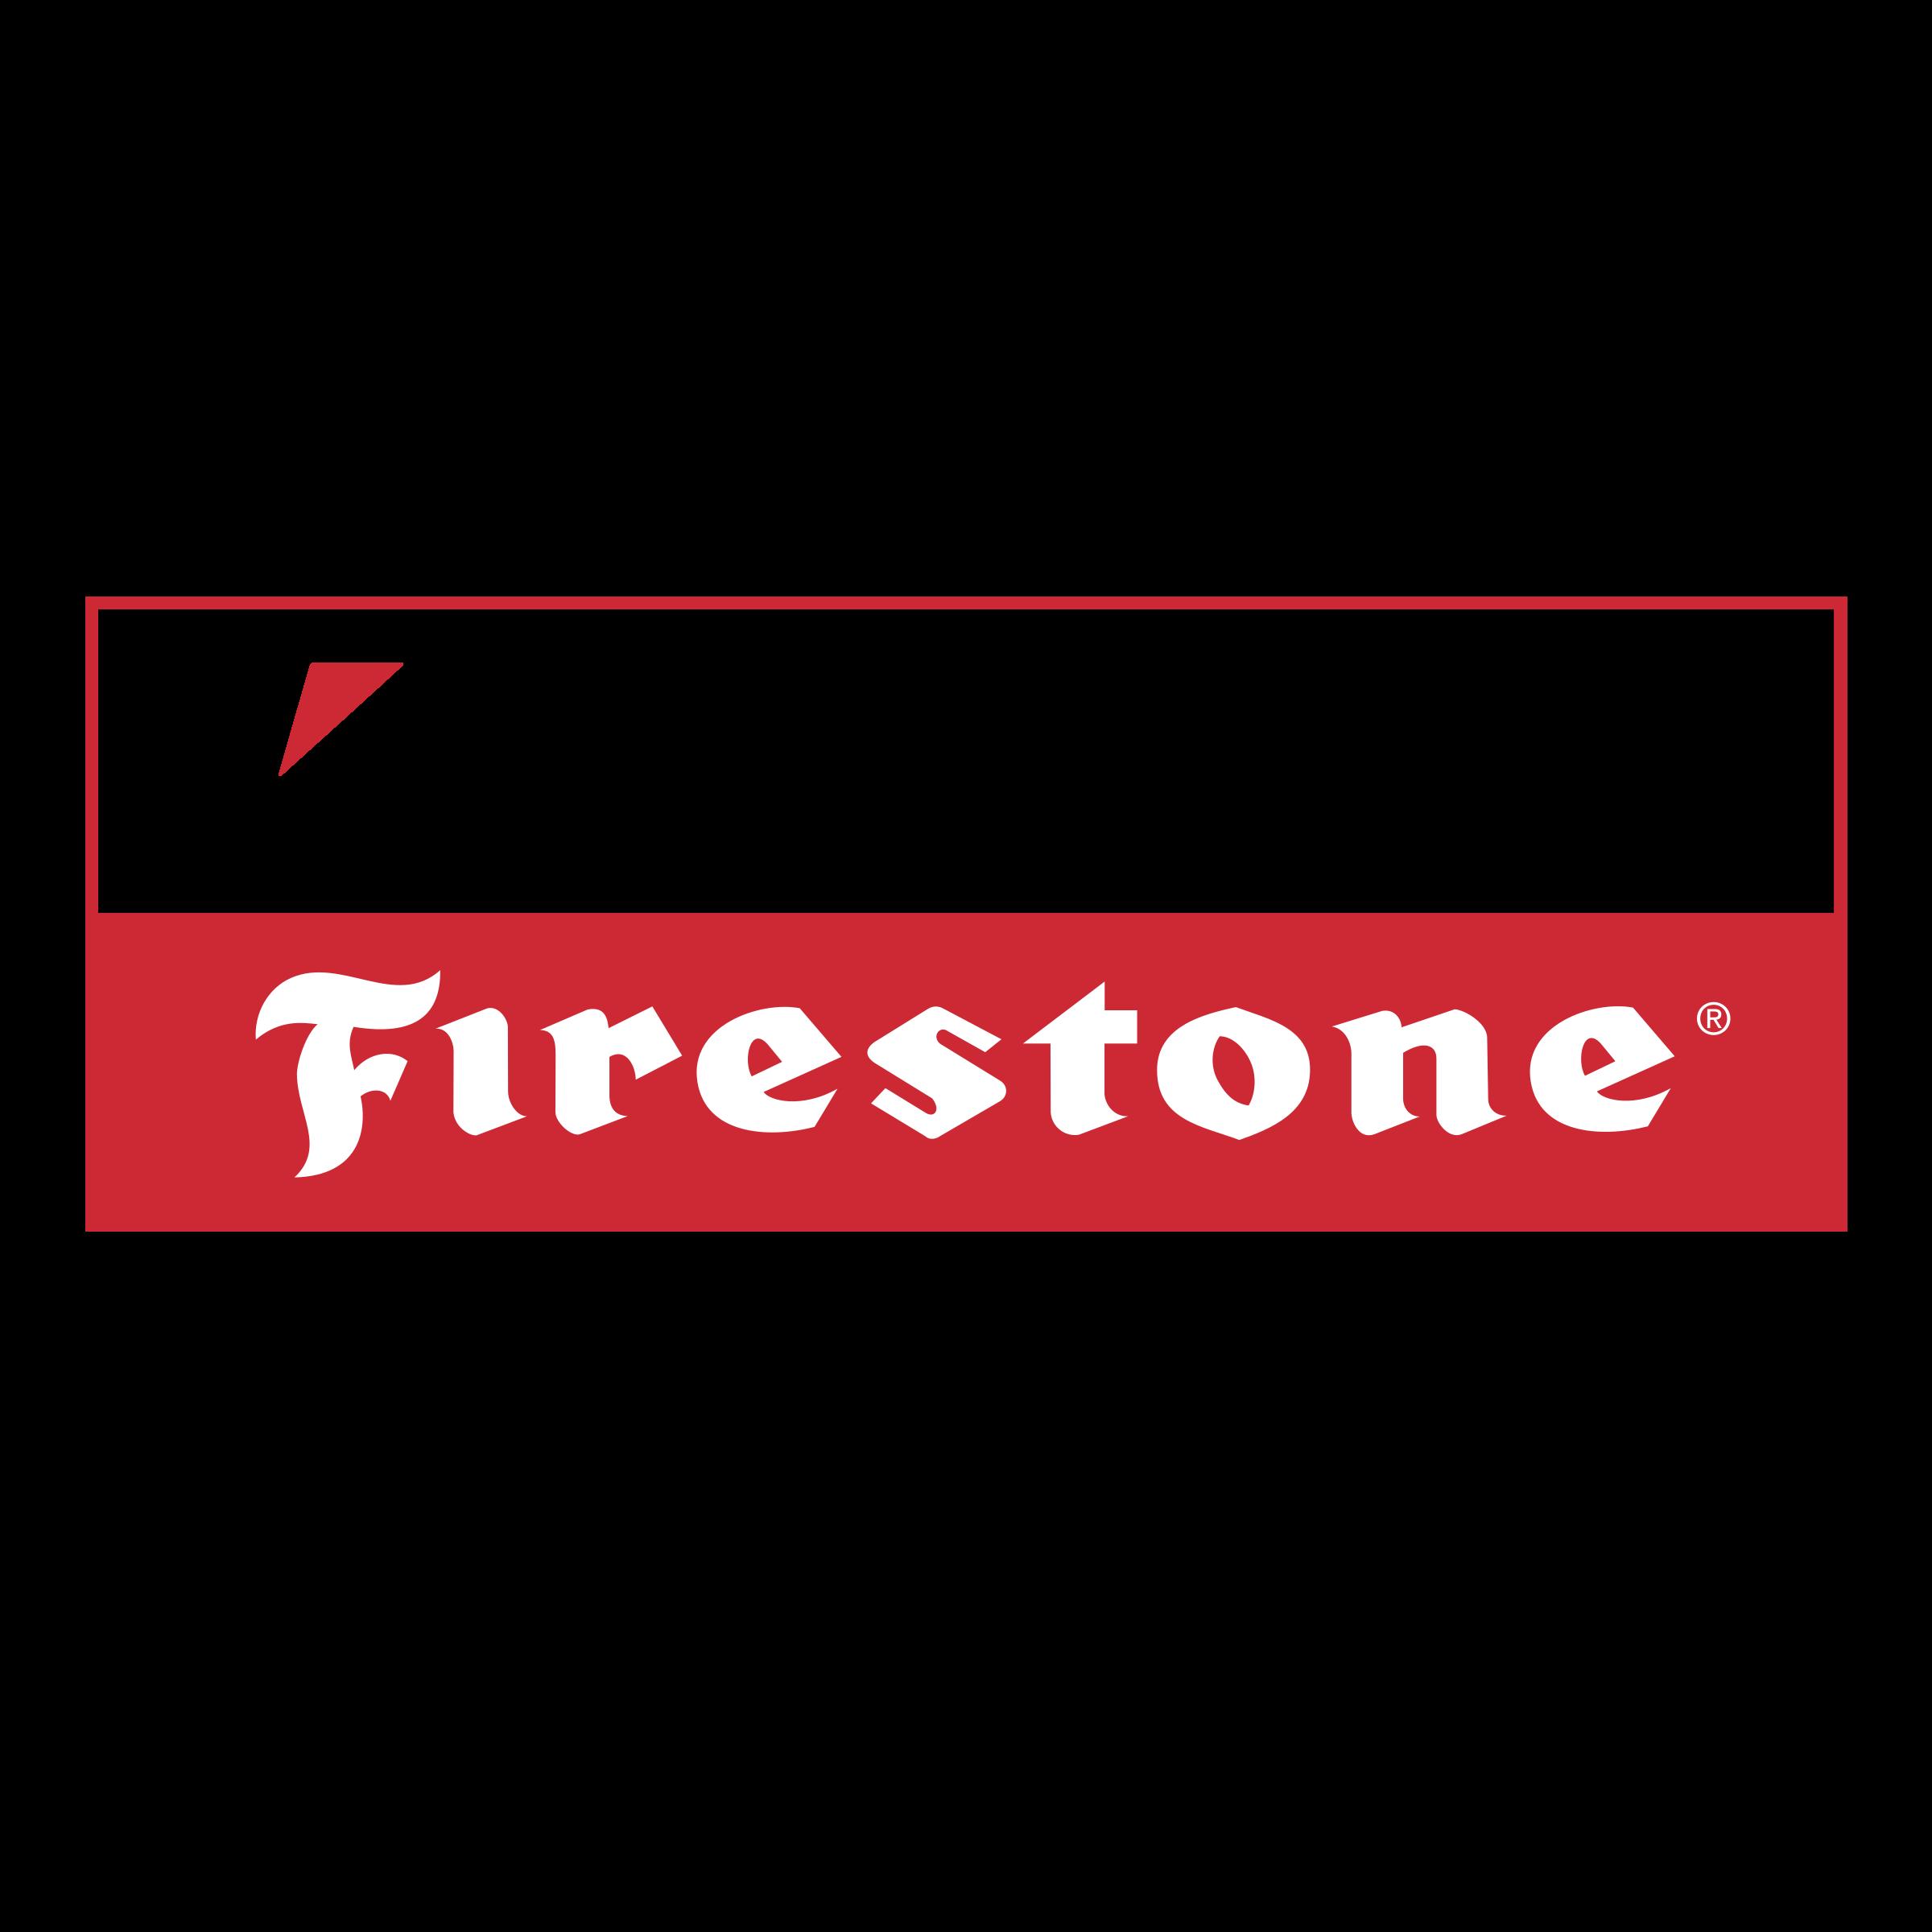 Bridgestone Firestone Trust Fund Logo Png Transparent & Svg Vector Pluspng.com  - Firestone Logo PNG